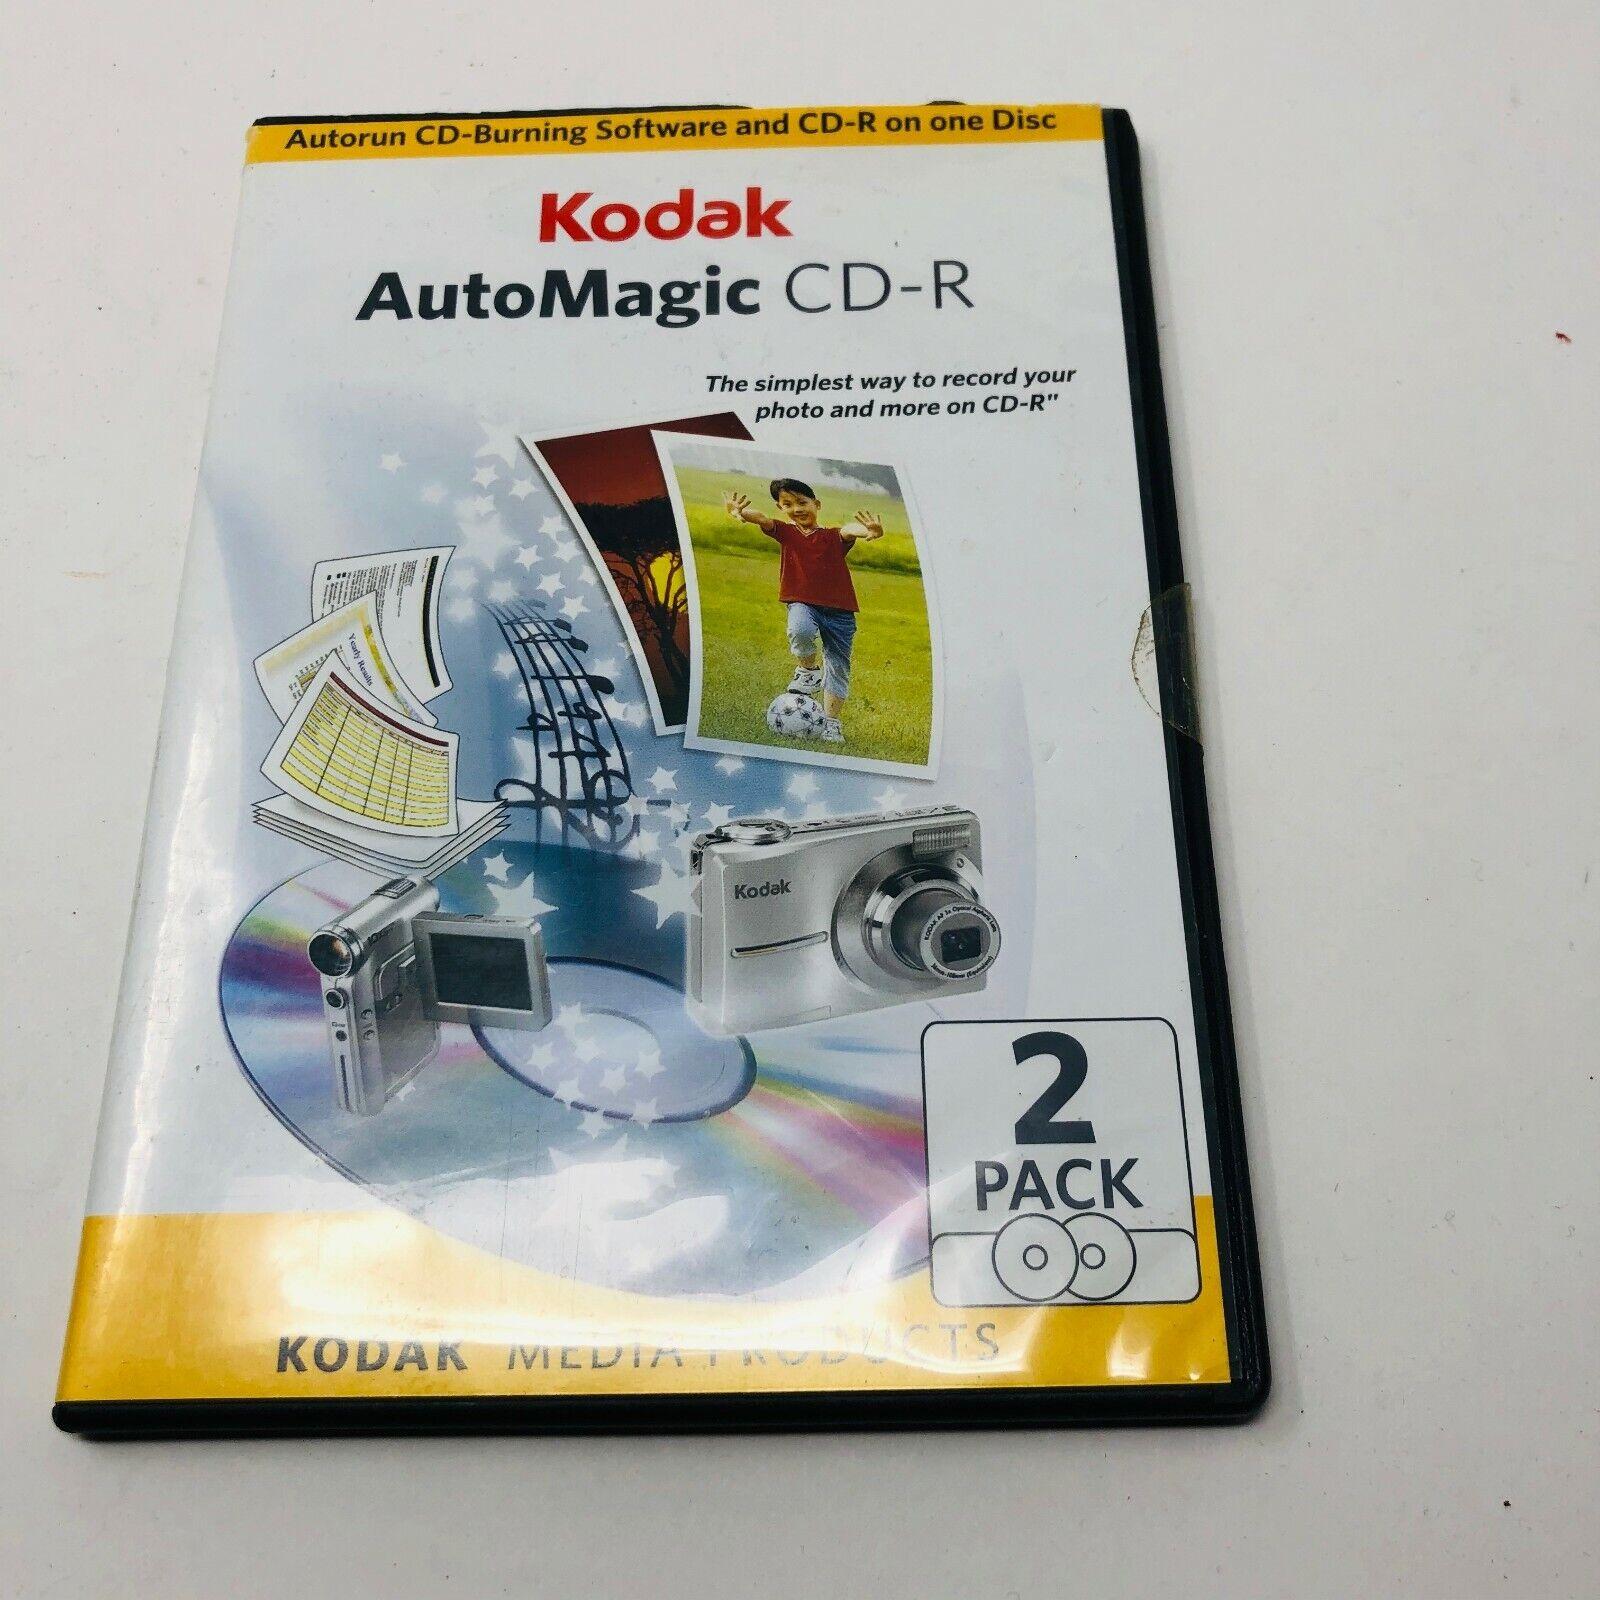 Kodak AutoMagic CD-R Autorun CD-Burning Software and CD-R